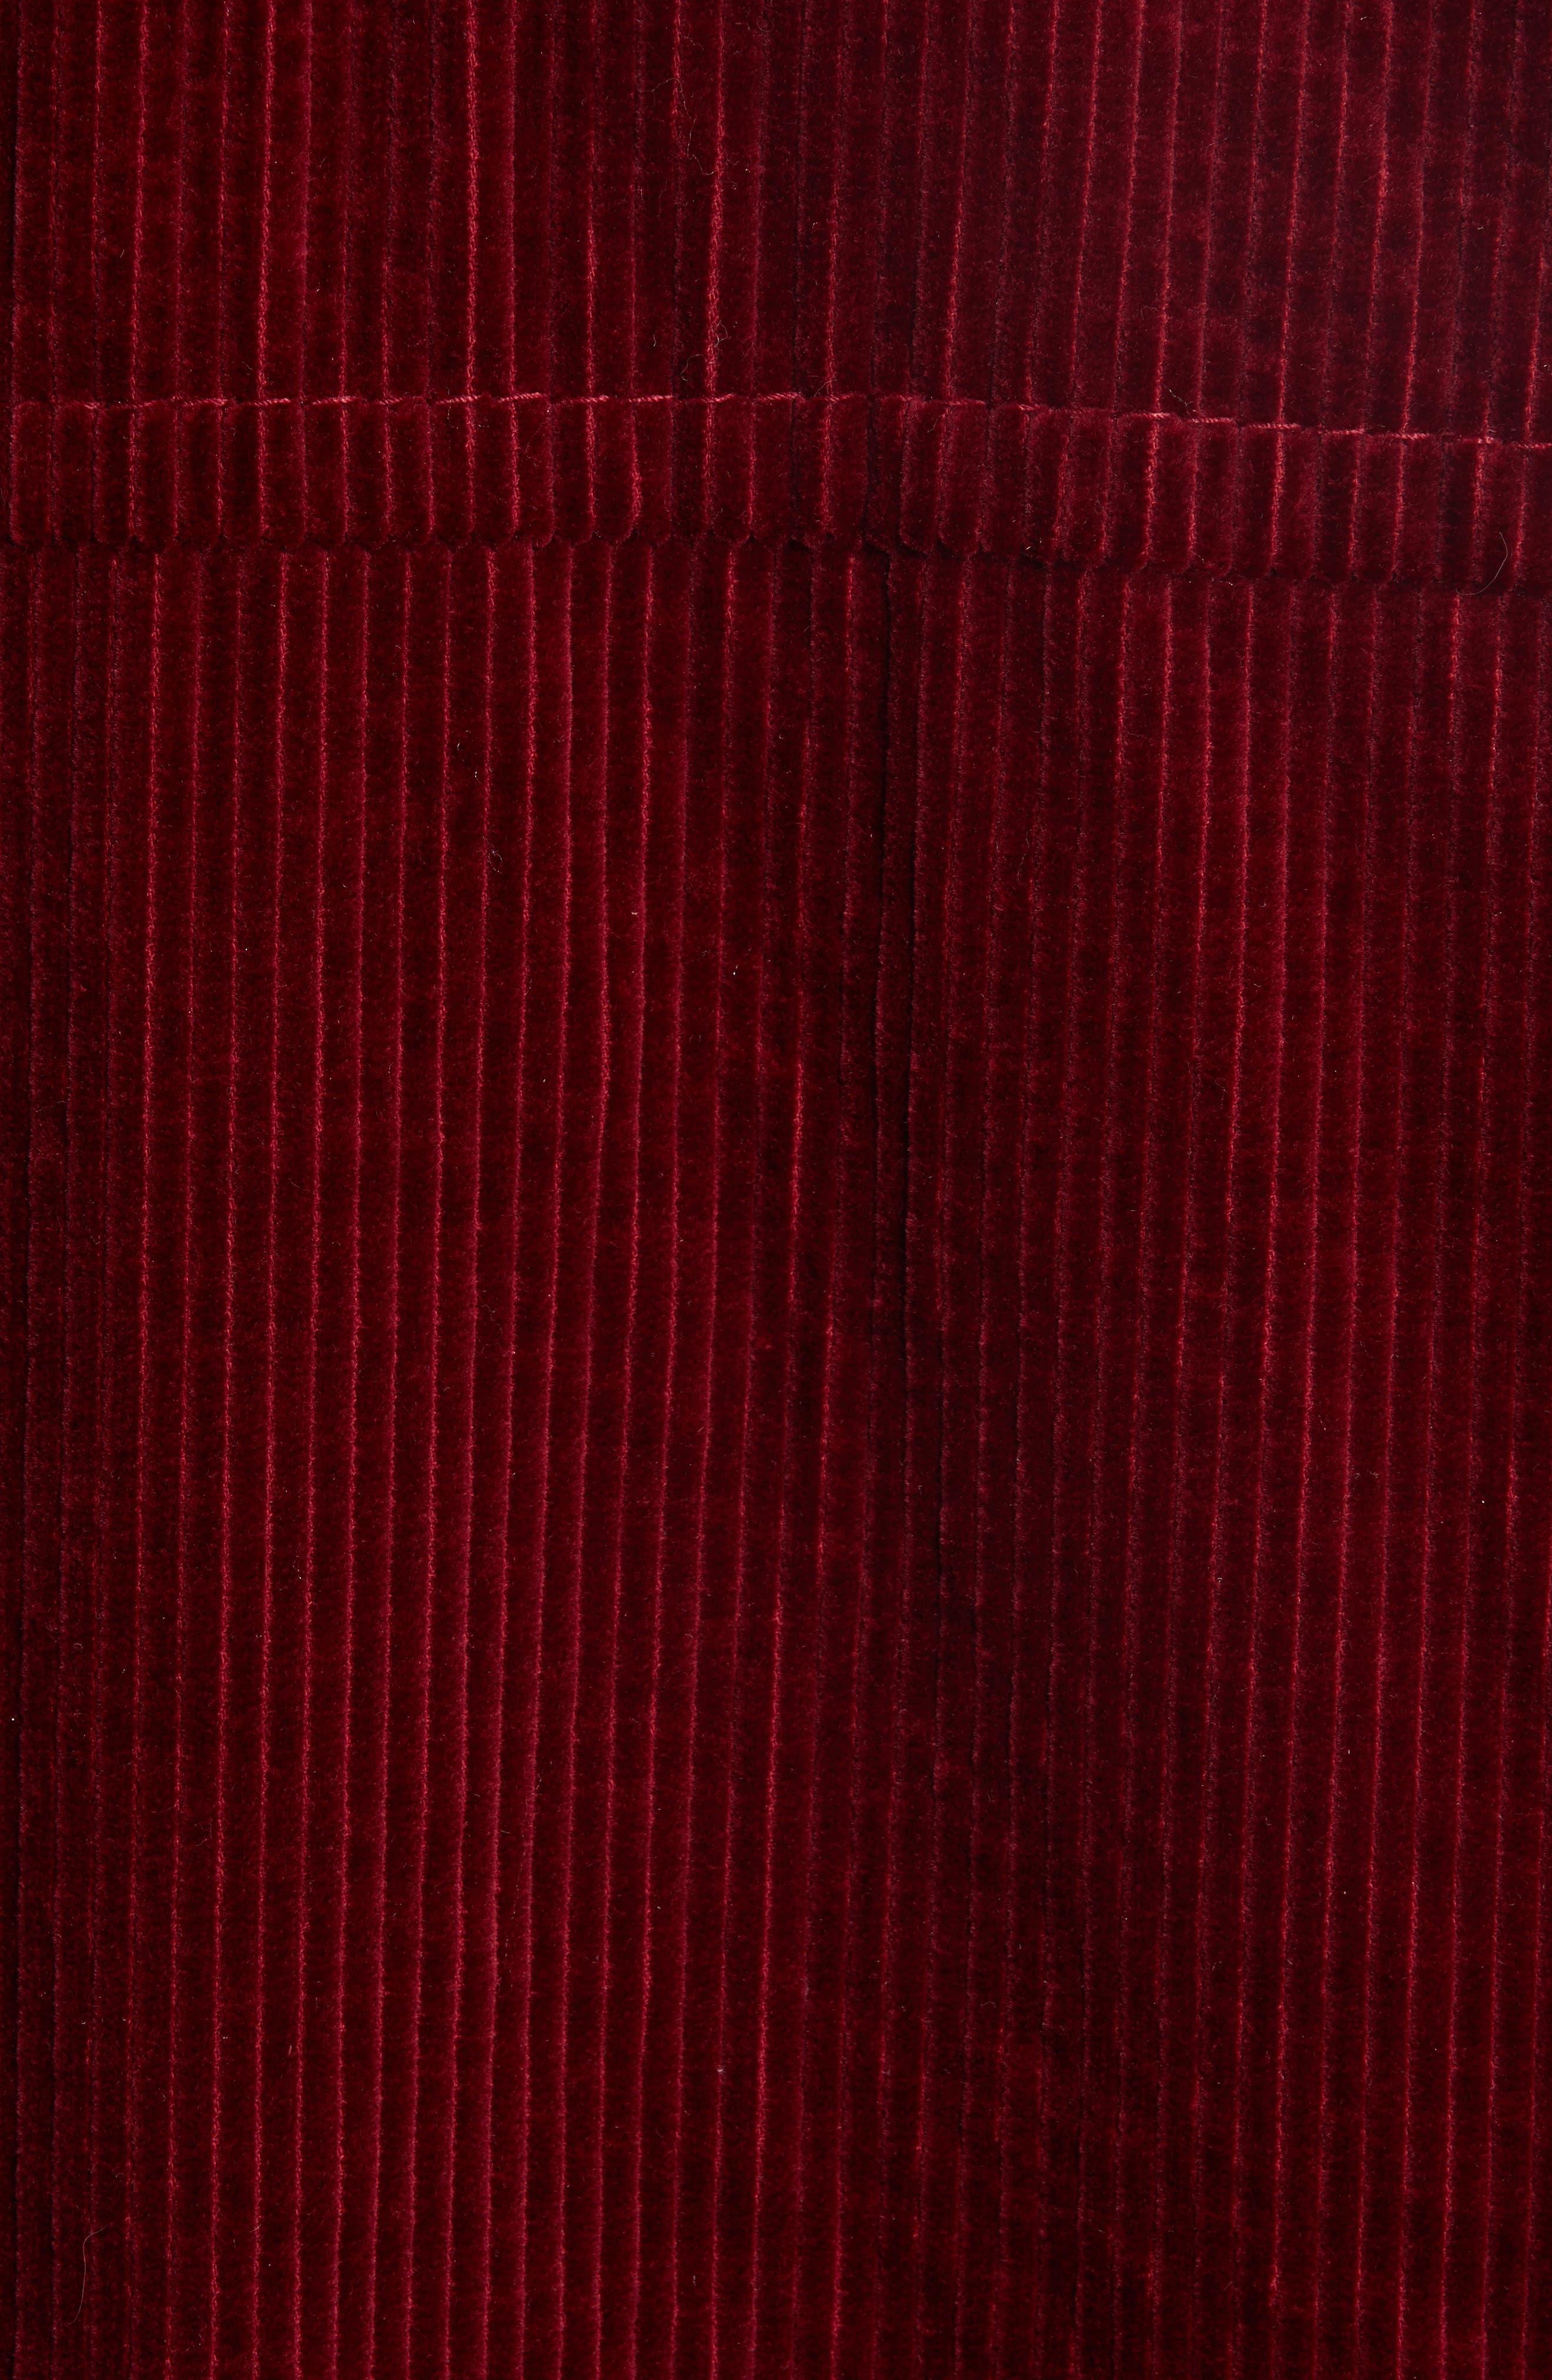 Corduroy Coat with Faux Shearling Collar,                             Alternate thumbnail 6, color,                             Bordeaux